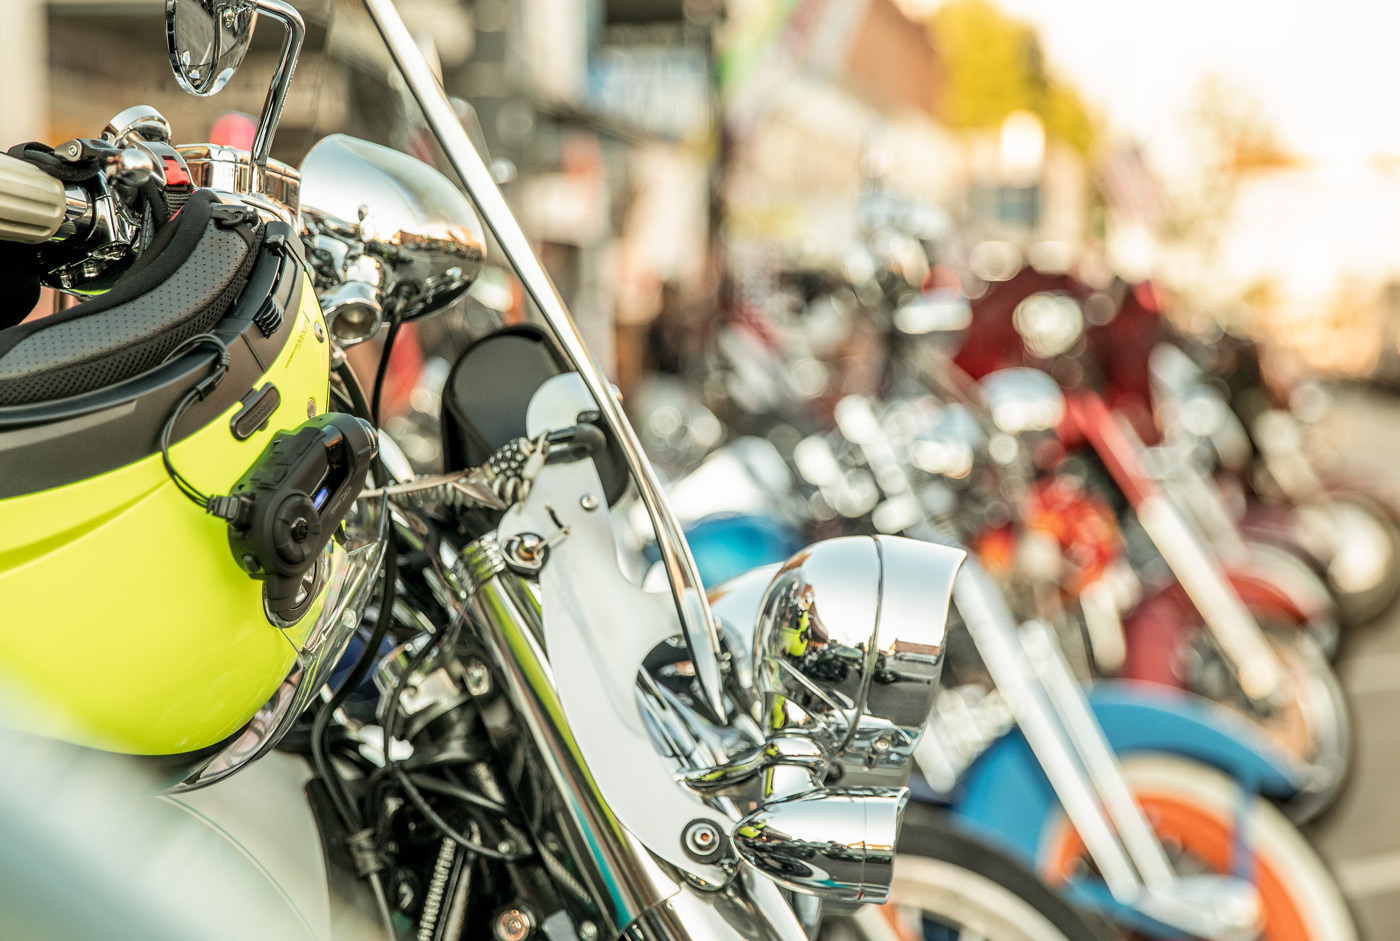 Sturgis-2019-Alyssa-Riding-and-Main-st-2